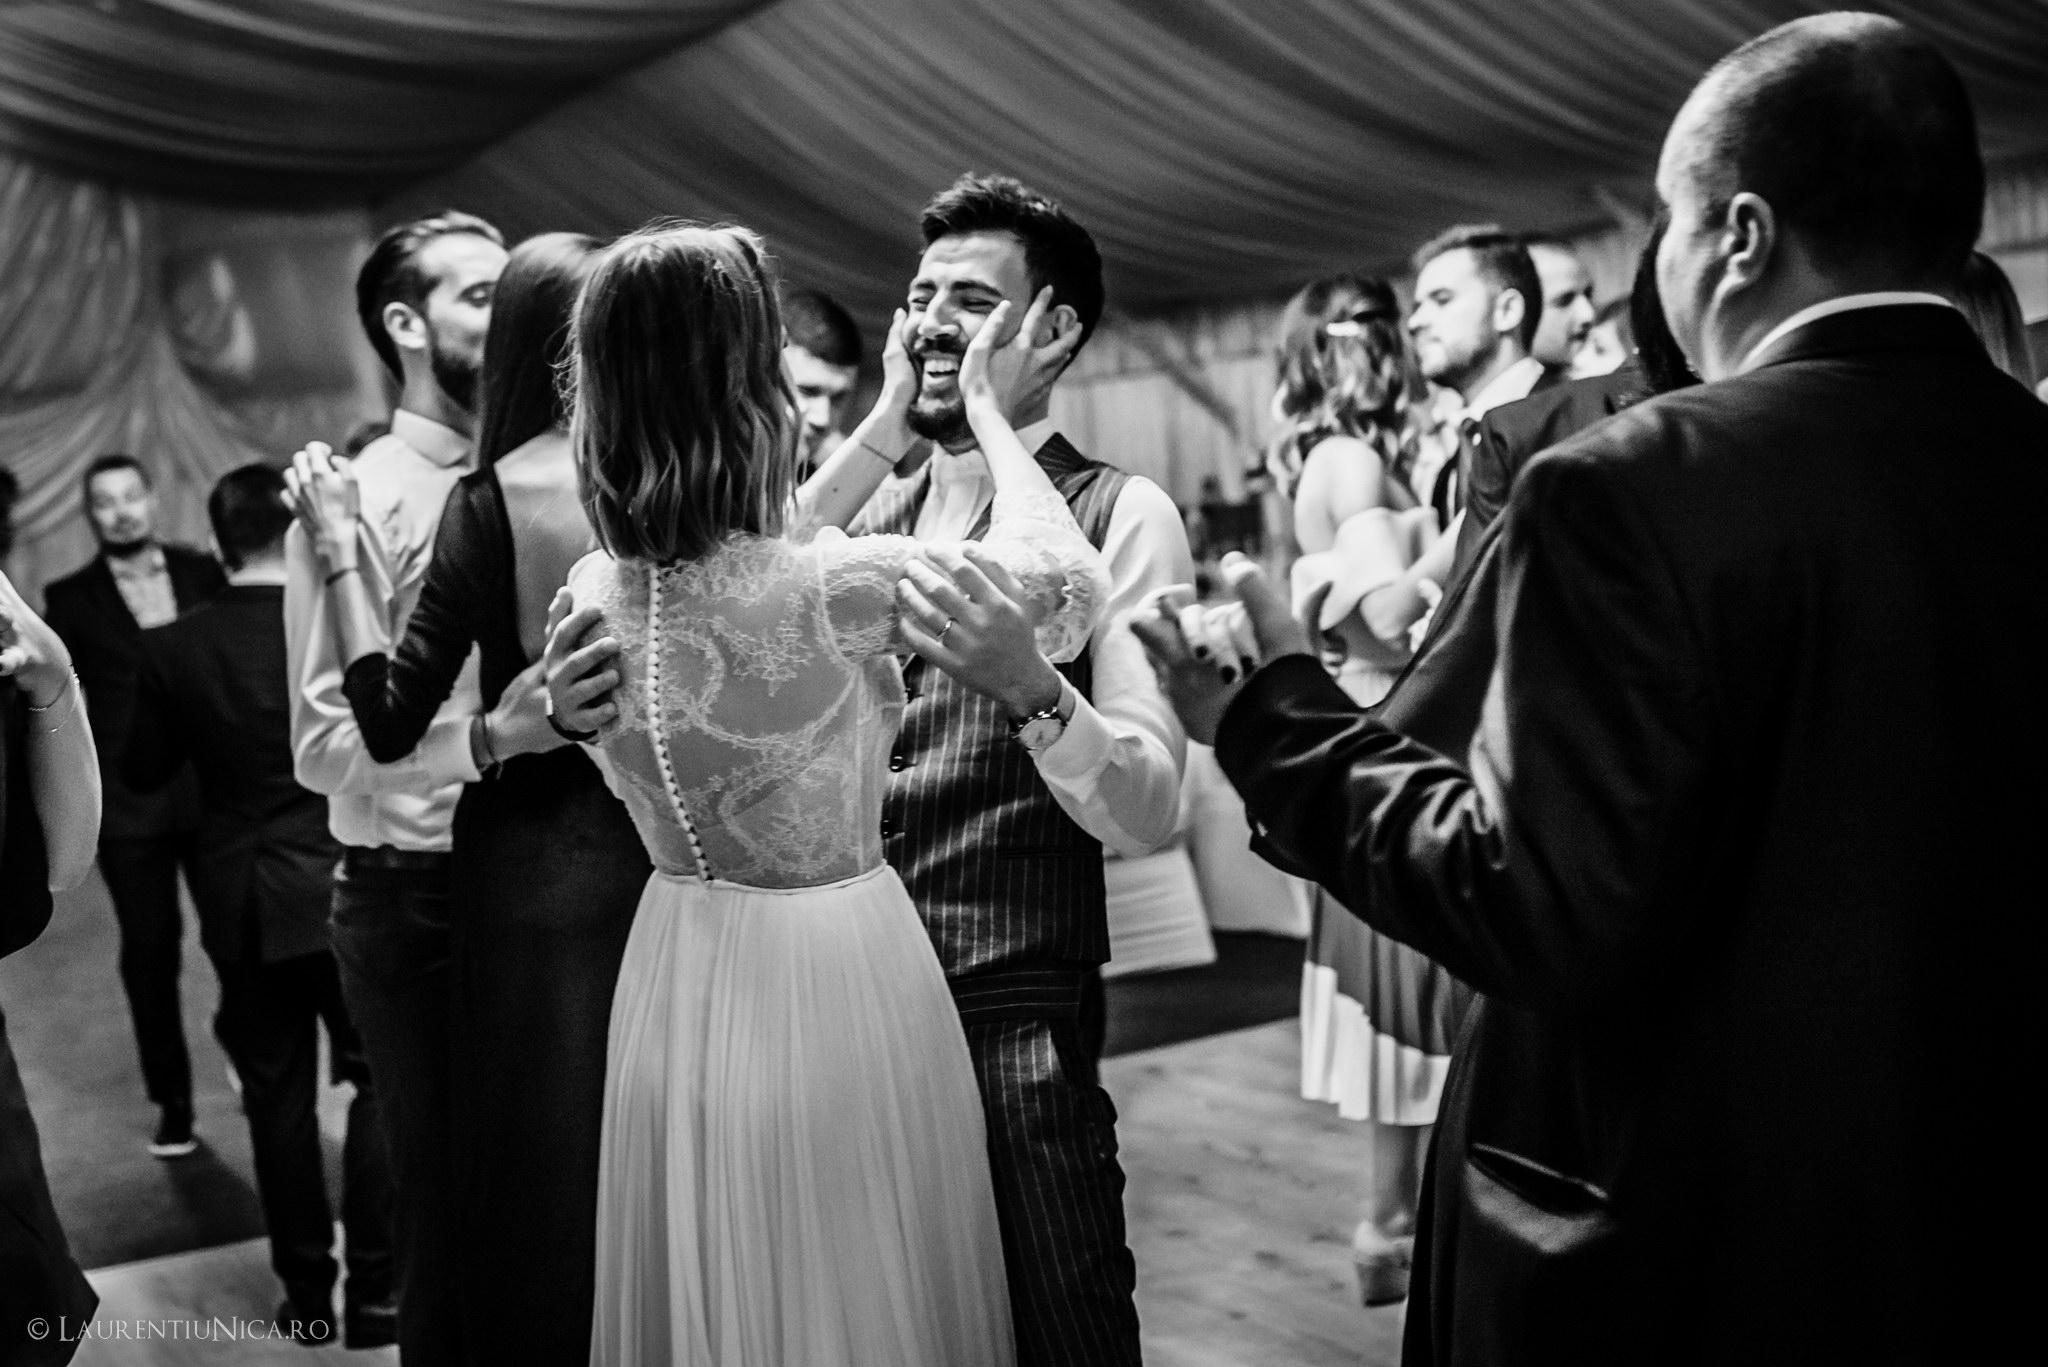 20180915 LN 0764 - Diana & Marius | Fotografii nunta | Slatina